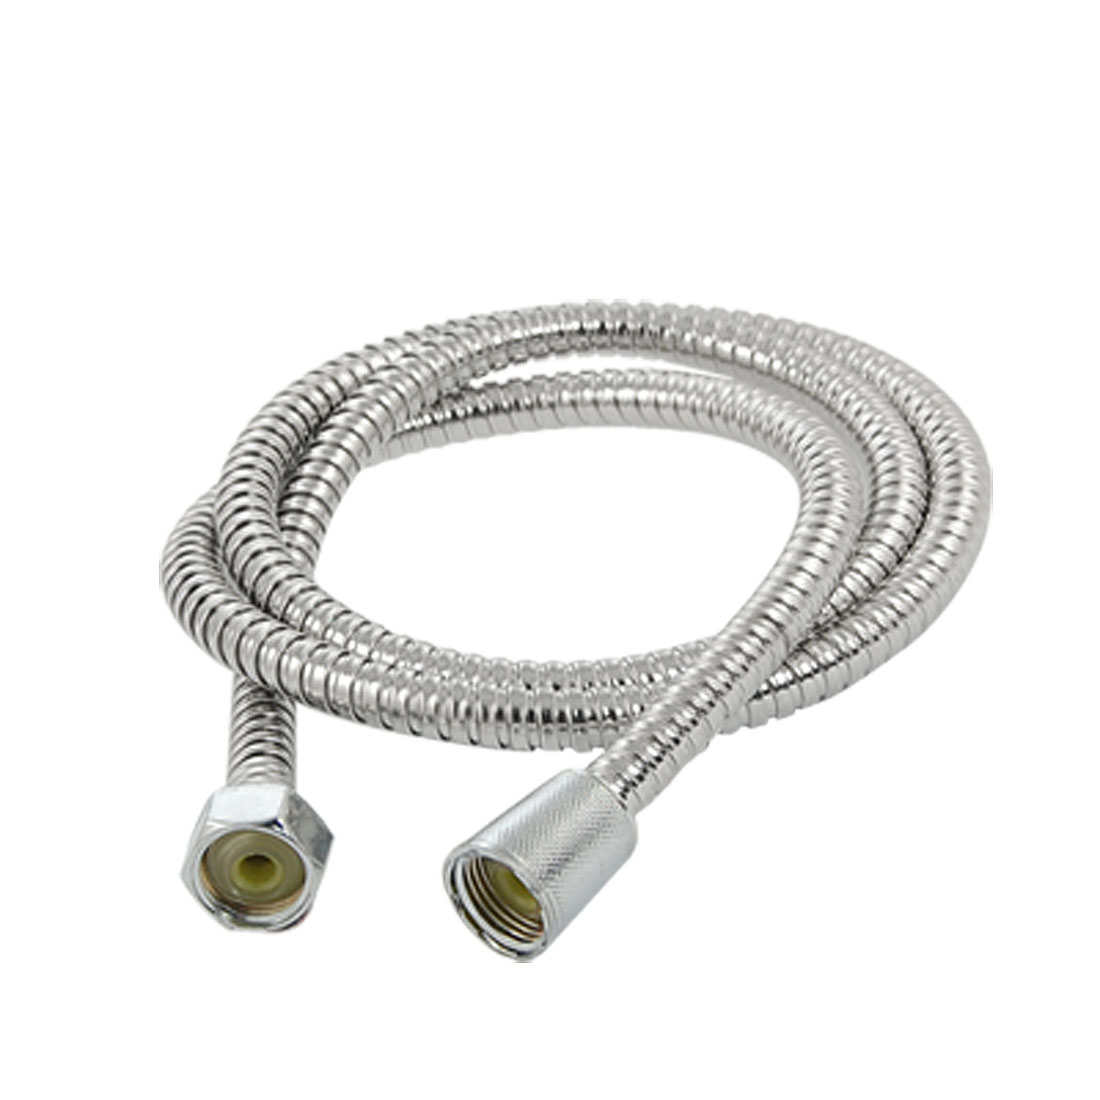 "Bathroom Fitting 47/64"" Thread 1.4M Flexible Metal Shower Hose Pipe"